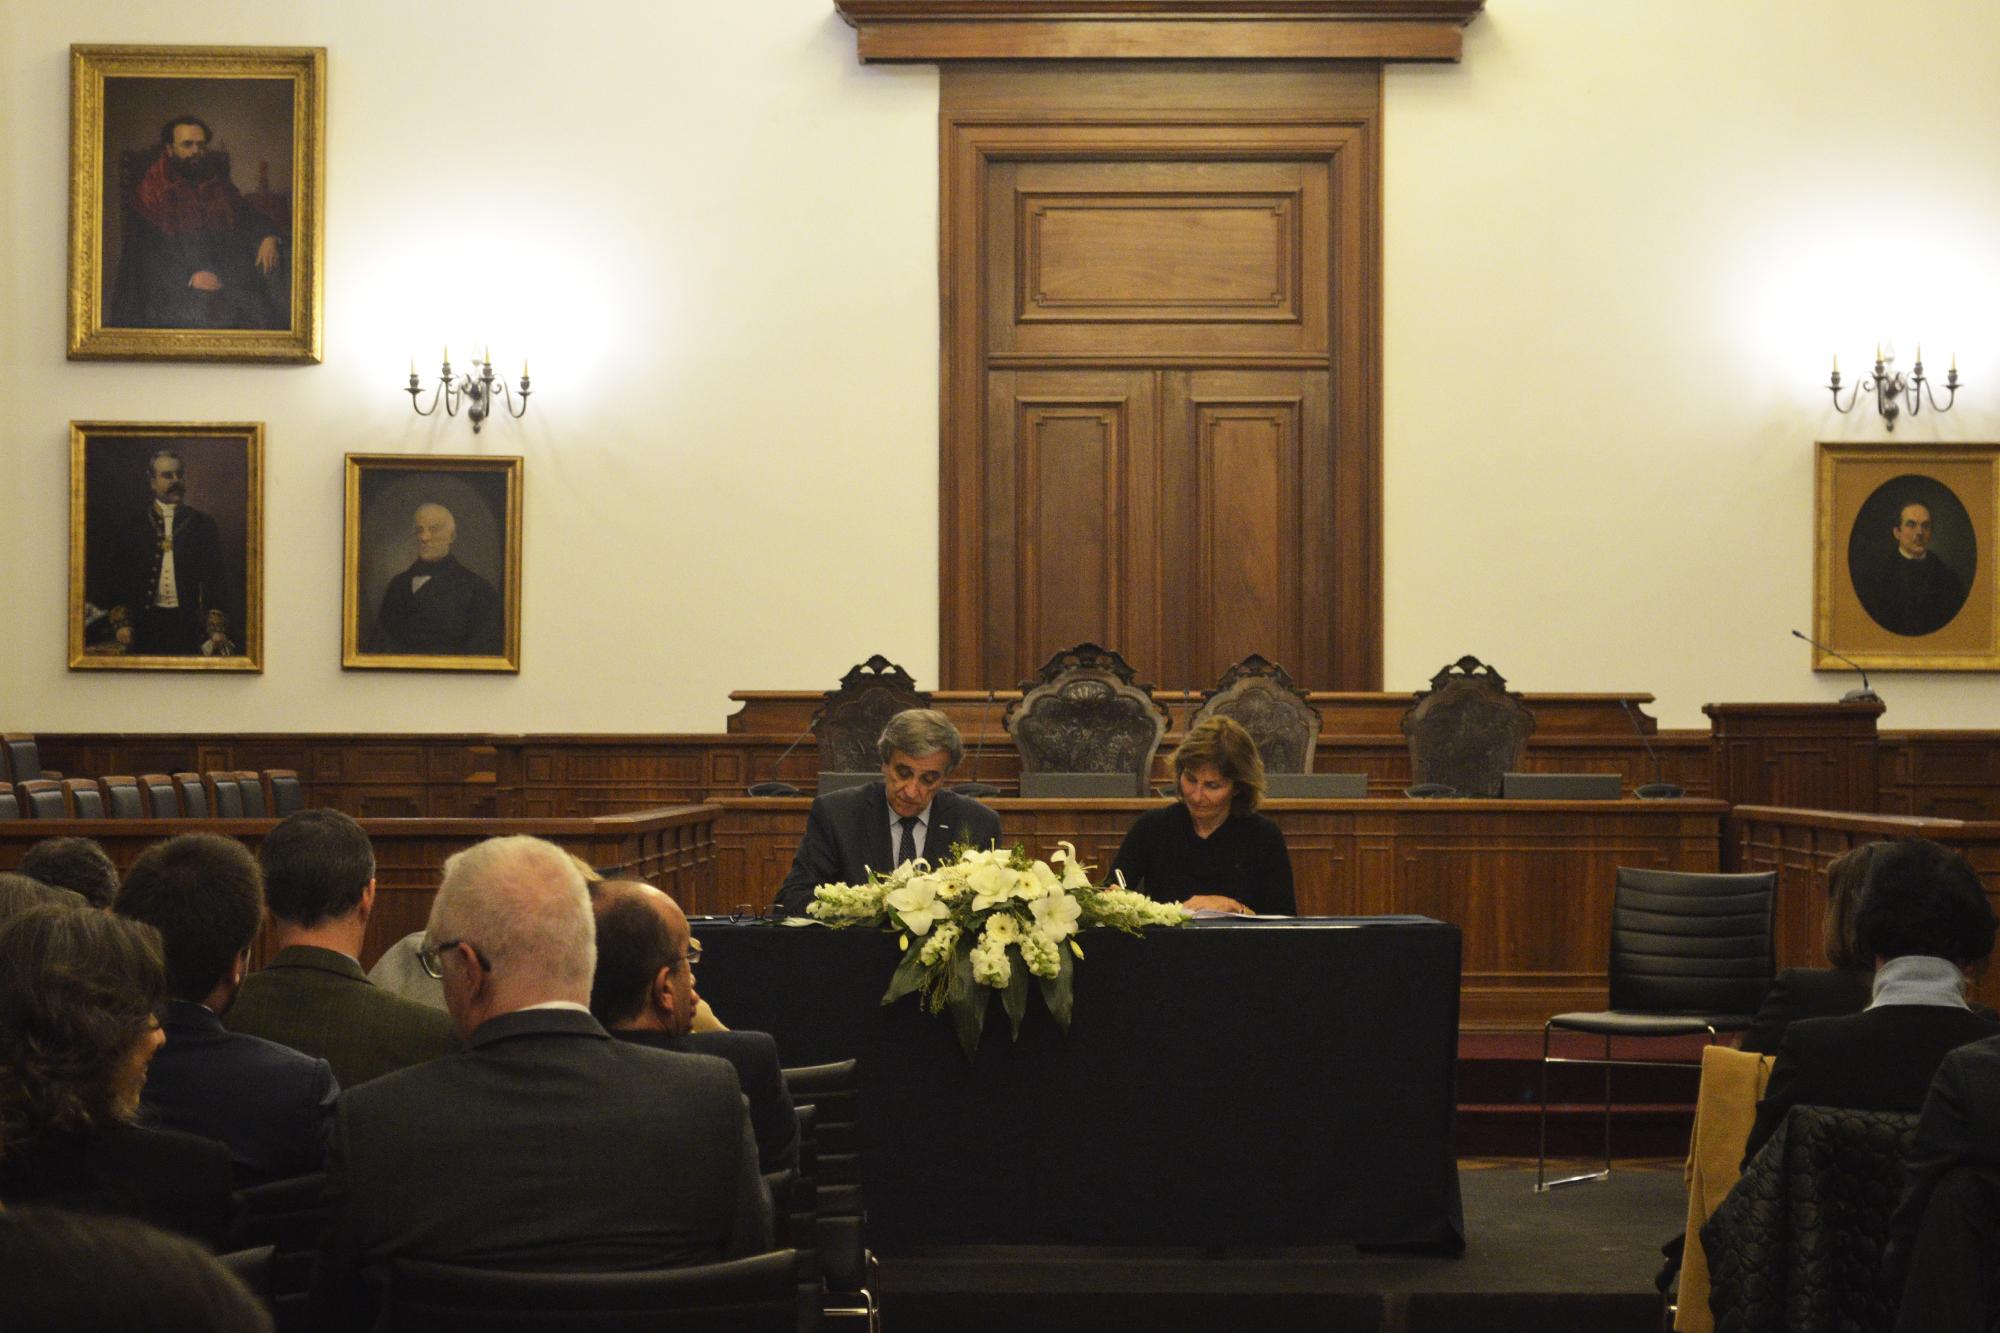 A vice-presidente Ana Maria Rodrigues representou Valongo.